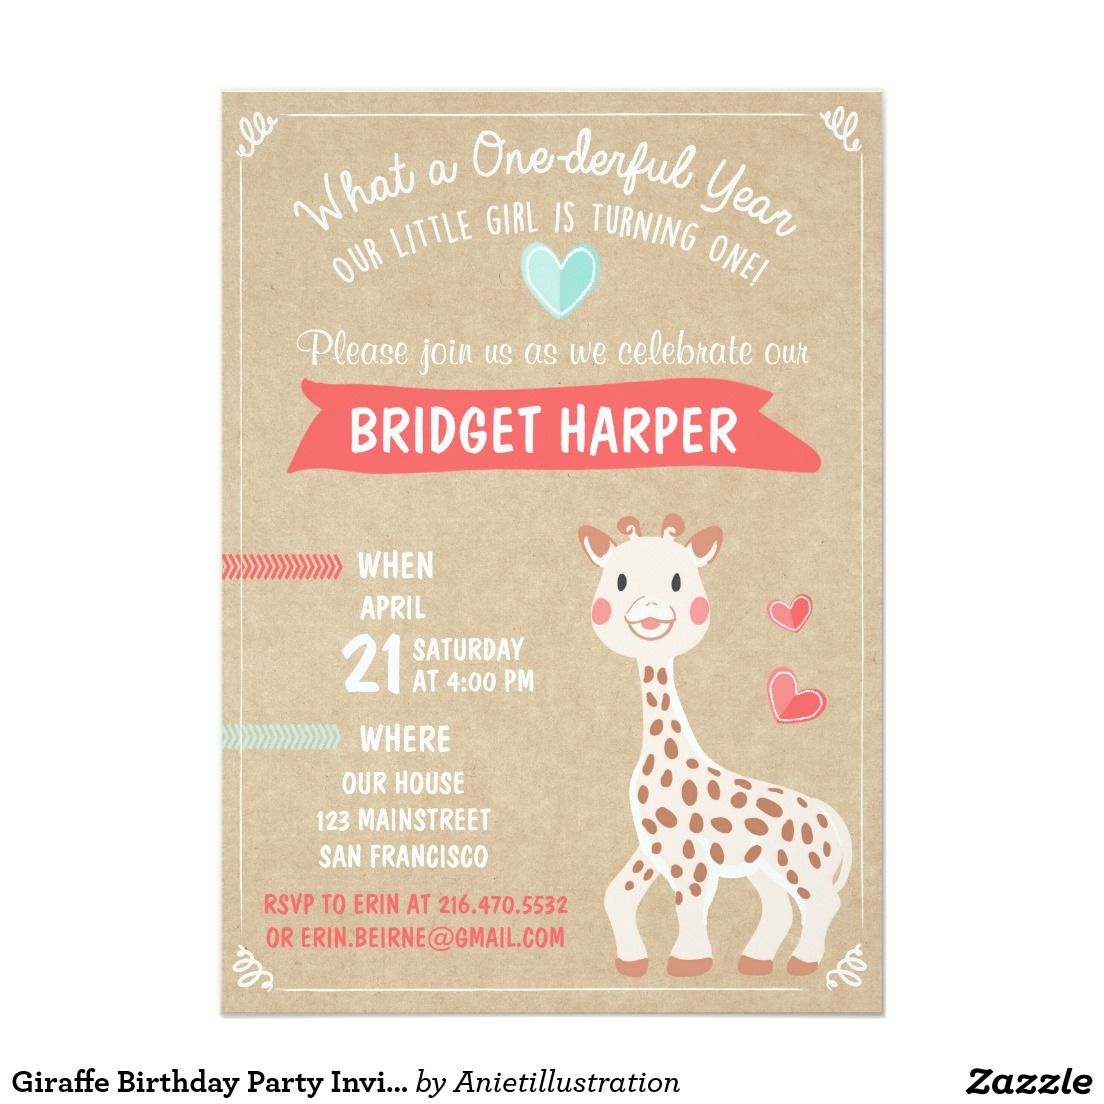 Giraffe Birthday Party Invitation First Birthday | Giraffe ...